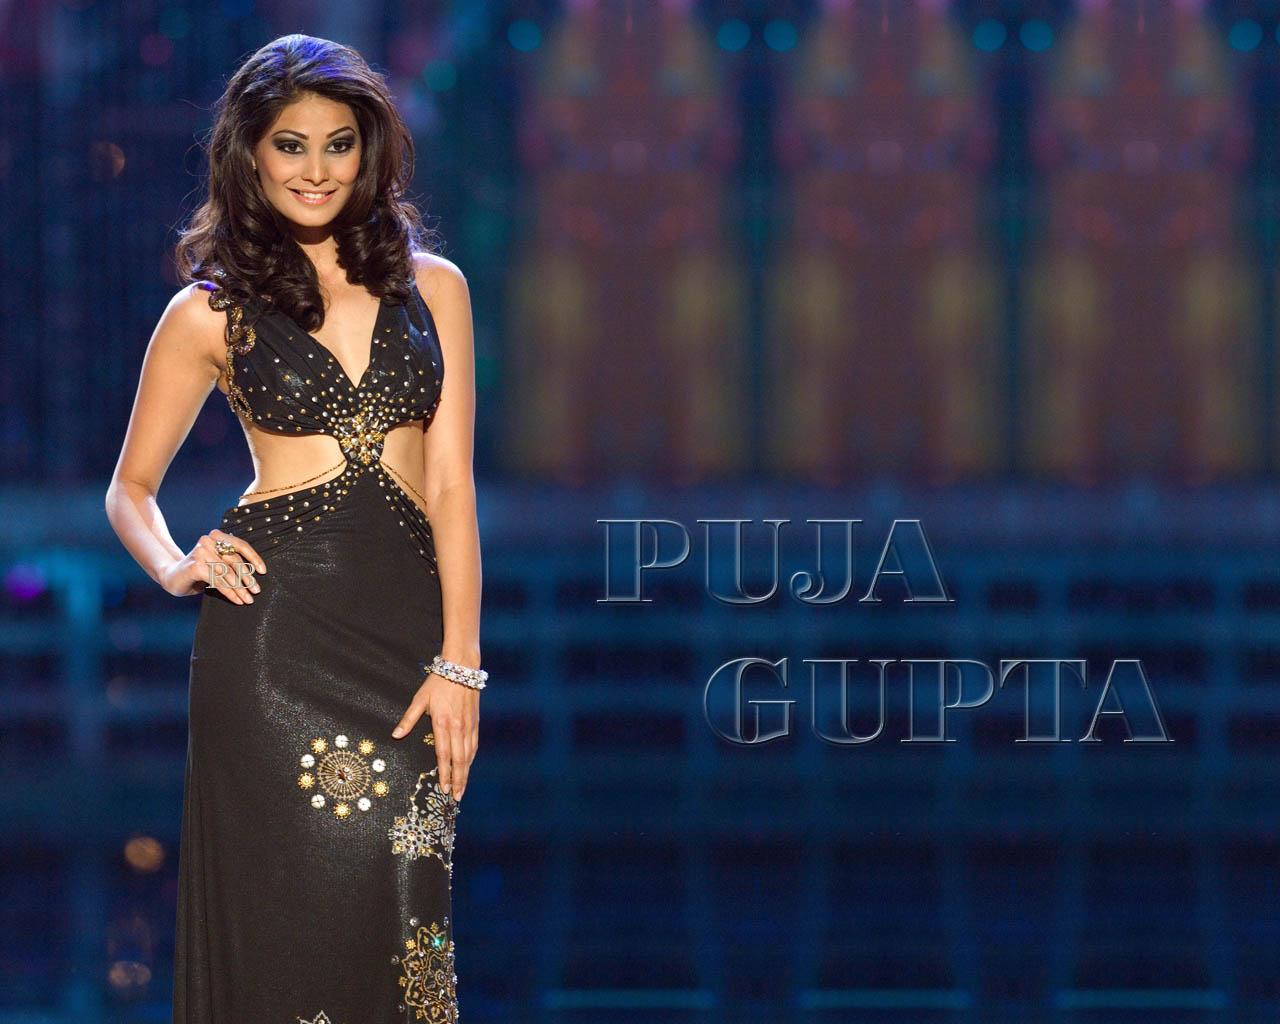 Puja Gupta hot wallpapers